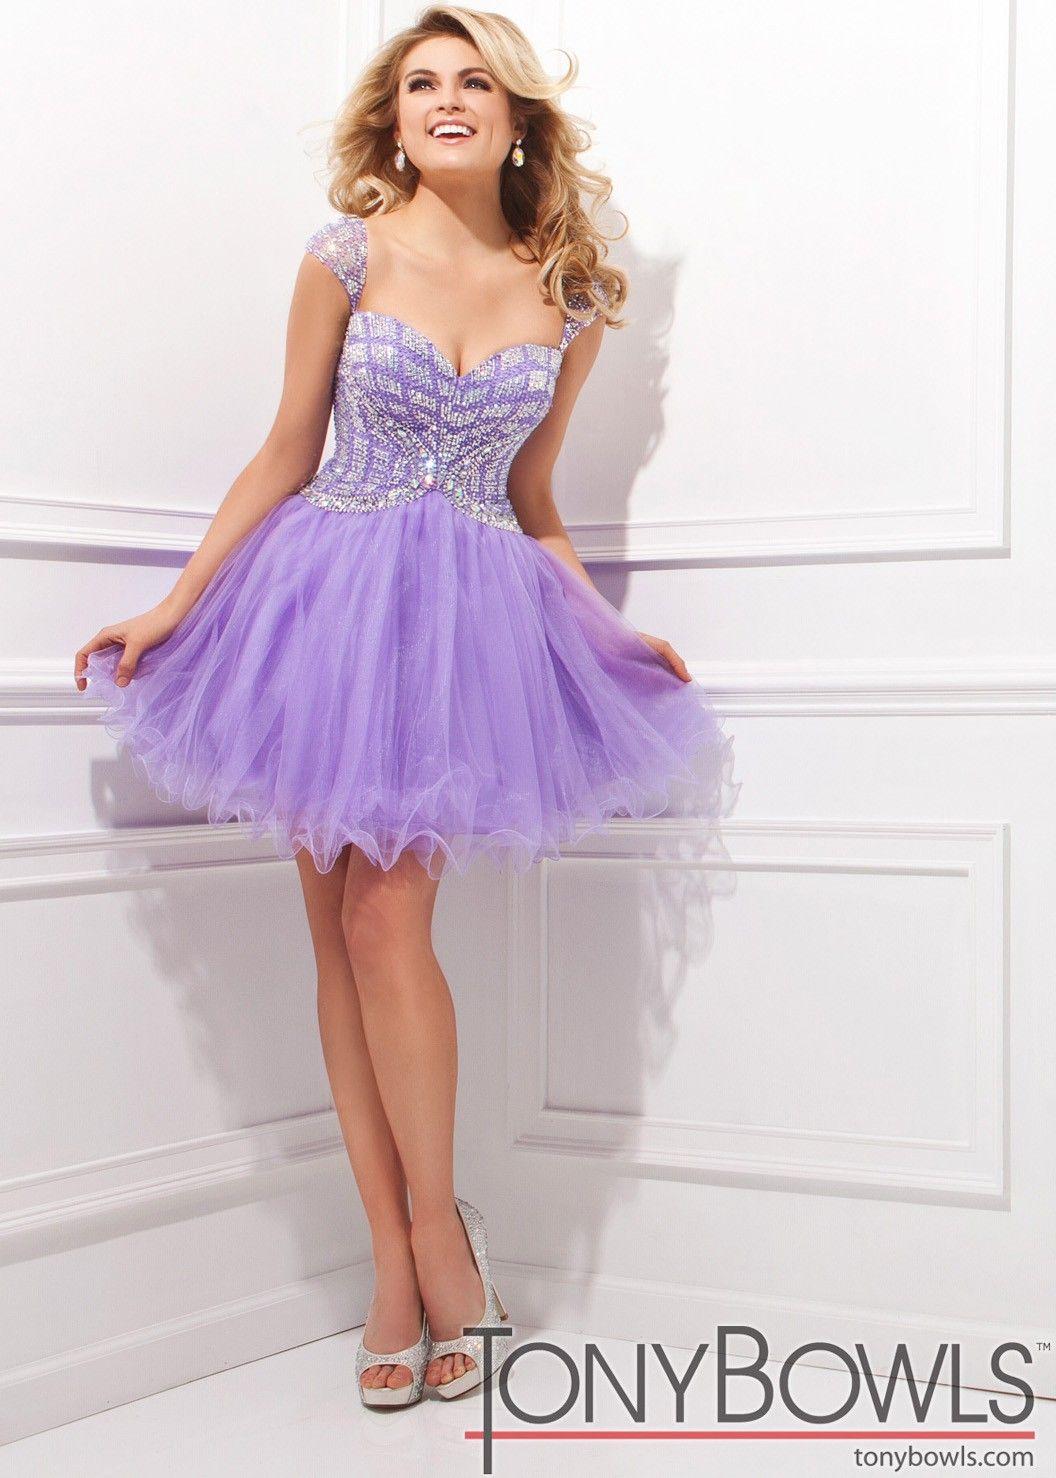 Sparkly Cocktail Dress   Moda   Pinterest   Estilo y Ropa